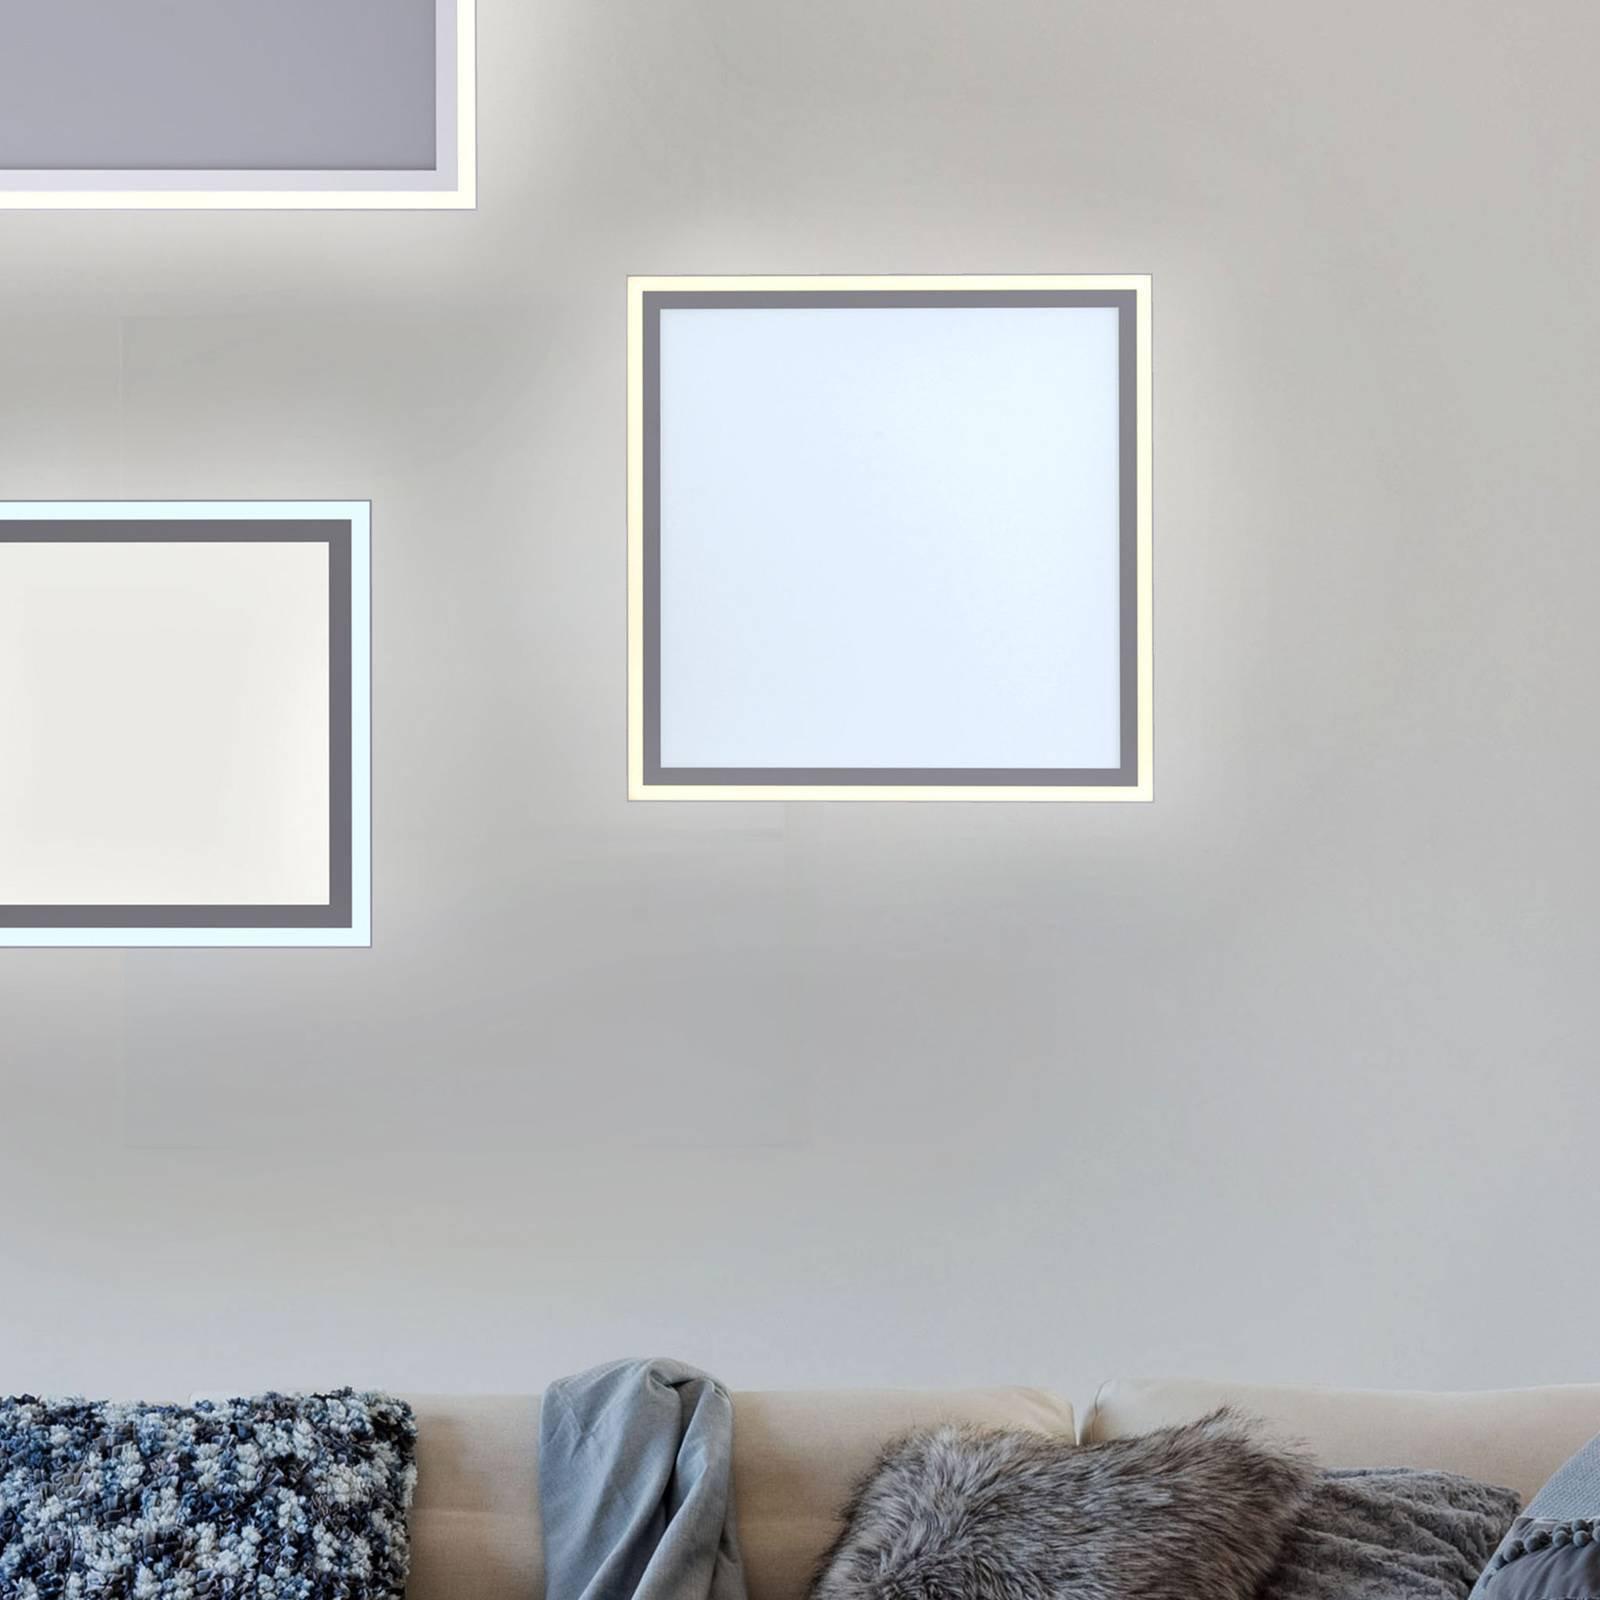 Edging LED-taklampe, tunable white, 46 x 46 cm